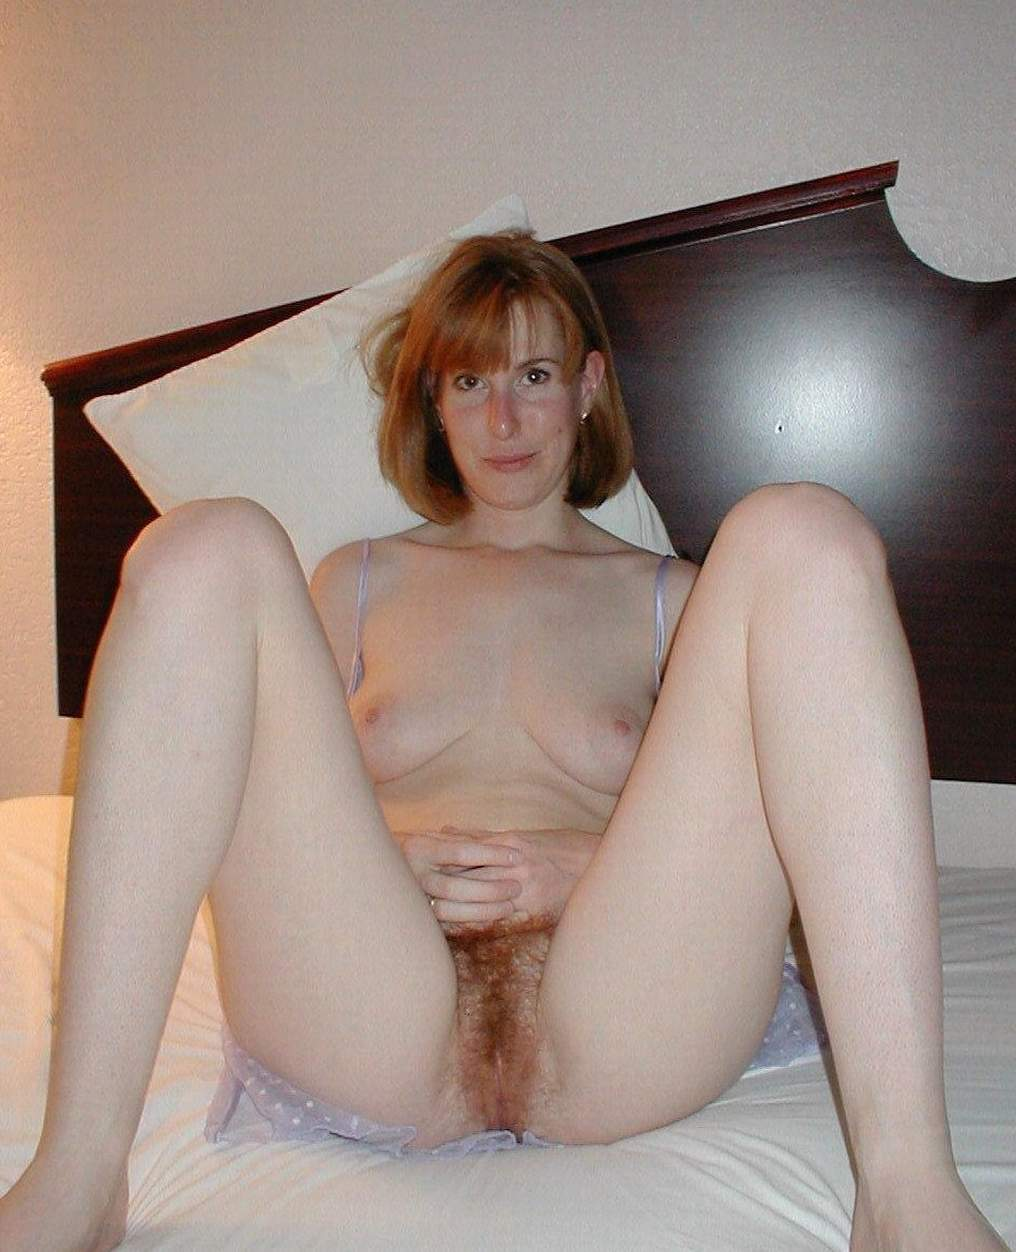 Huge boob ass lick lesbians